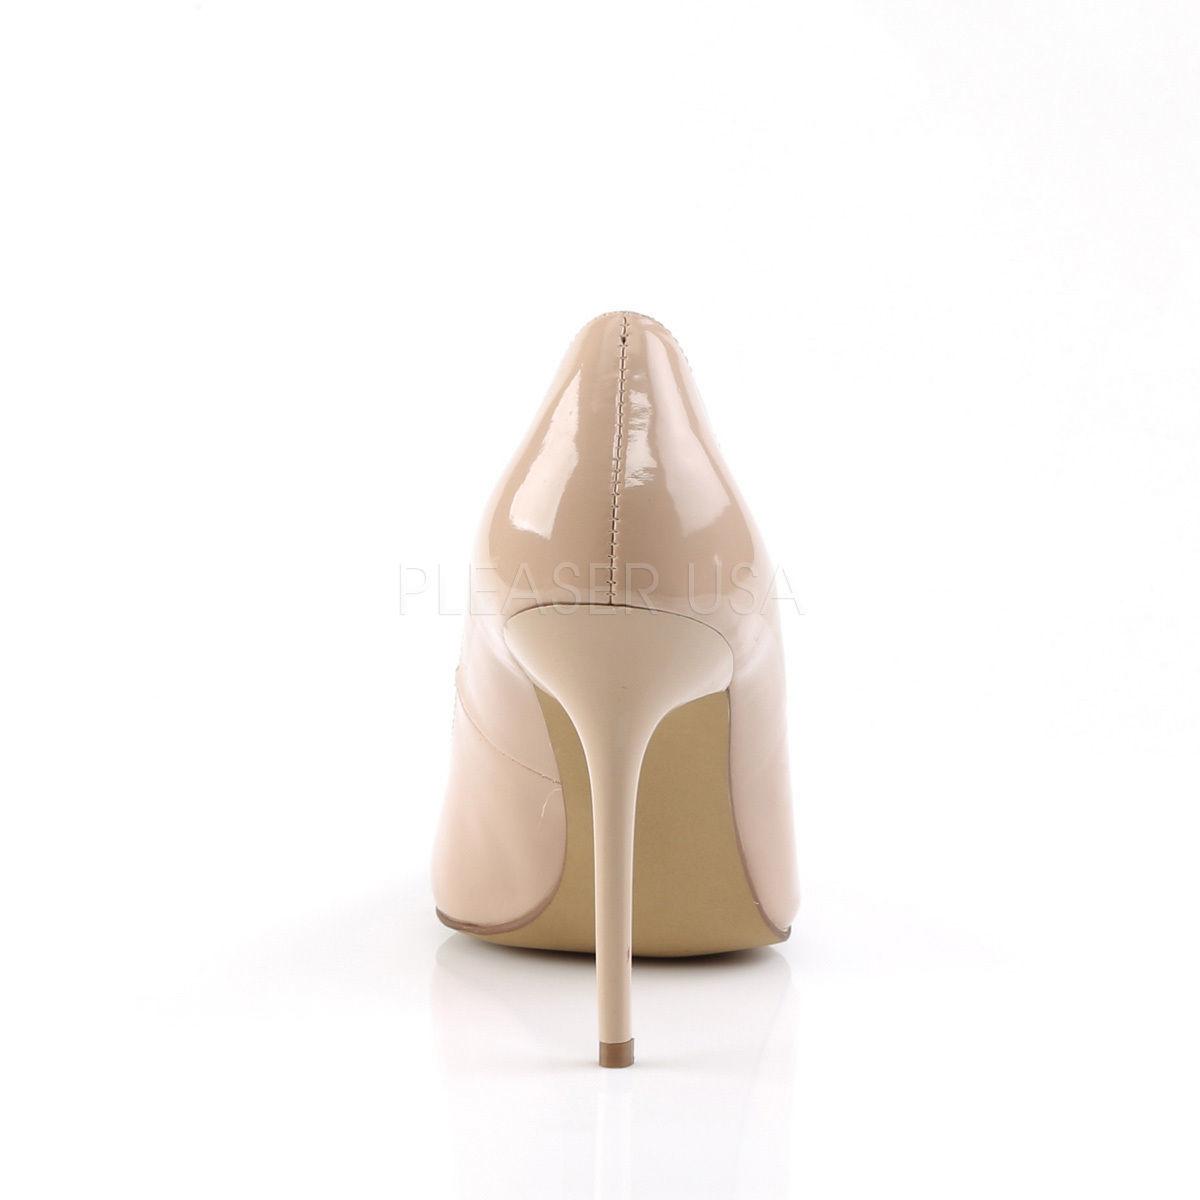 f0b63e01558 SALE PLEASER Shoes Sexy Pointed Toe Tan Cream 4